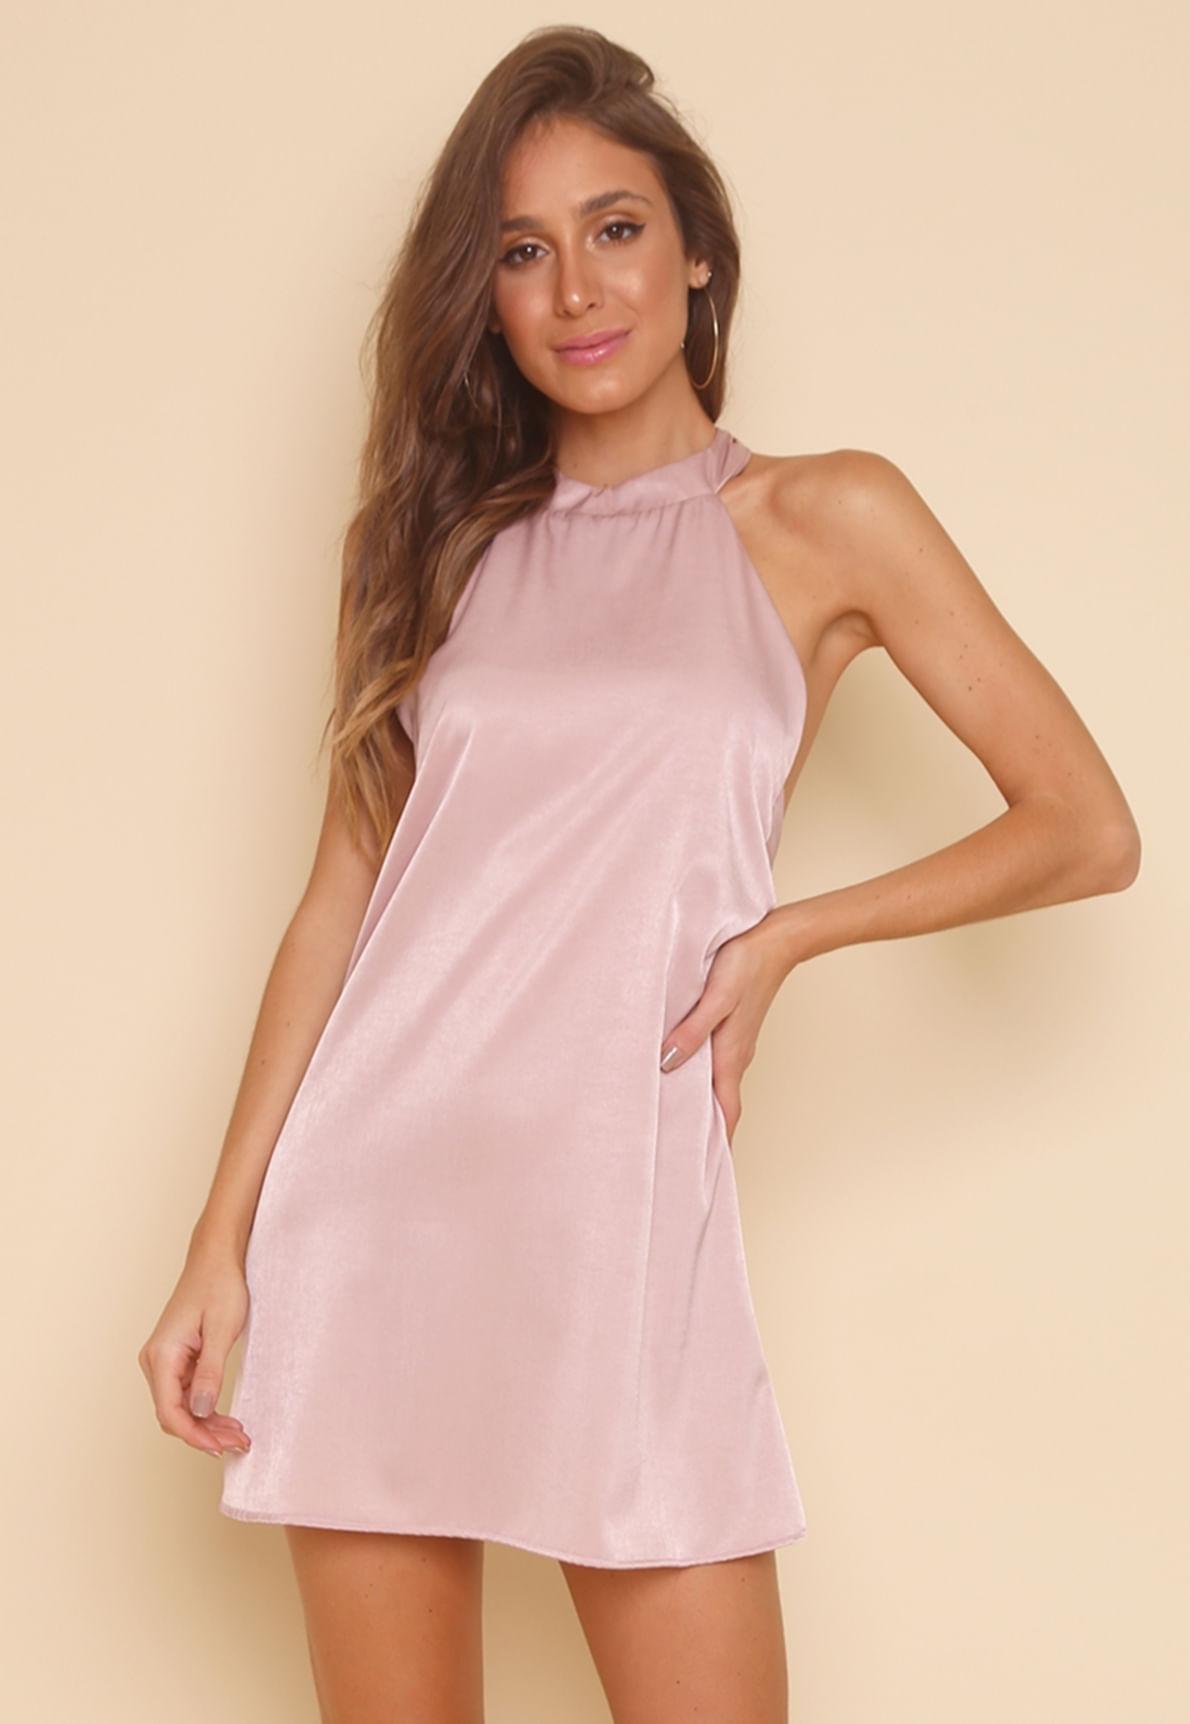 27451-vestido-rose-renata-mundo-lolita-03